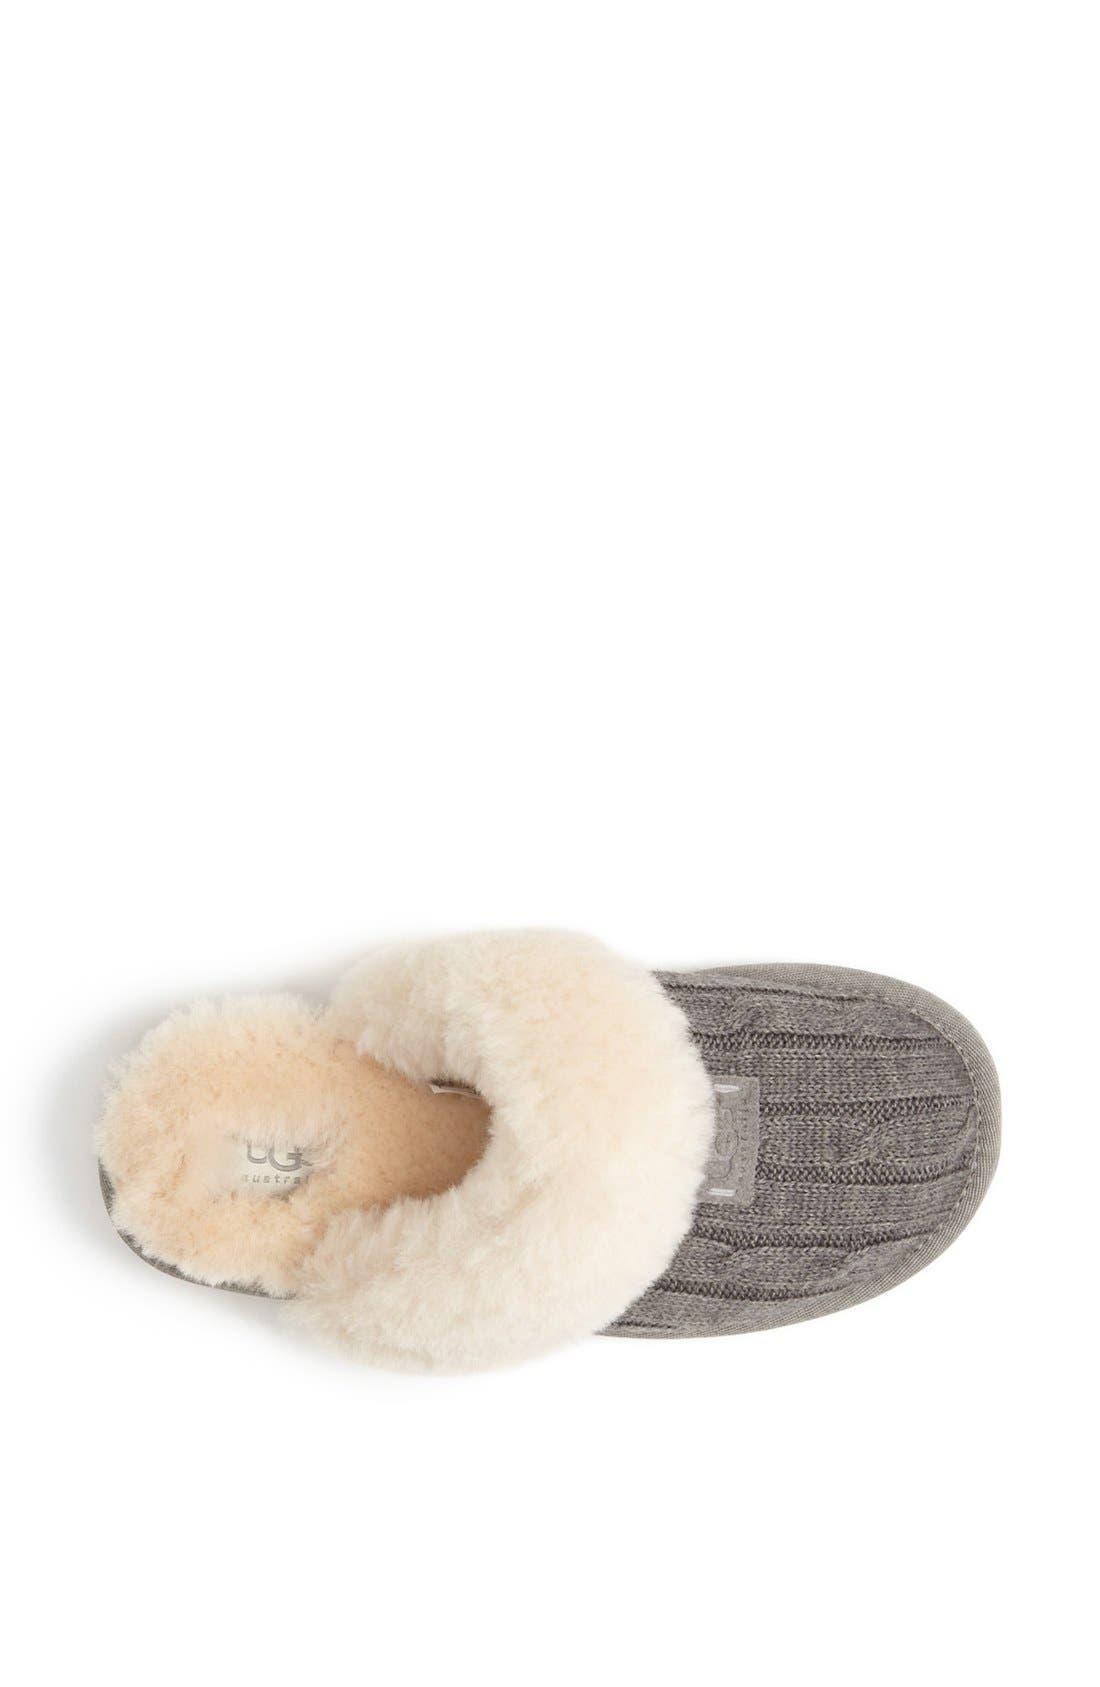 Alternate Image 3  - UGG® Australia 'Cozy' Knit Slipper (Women)